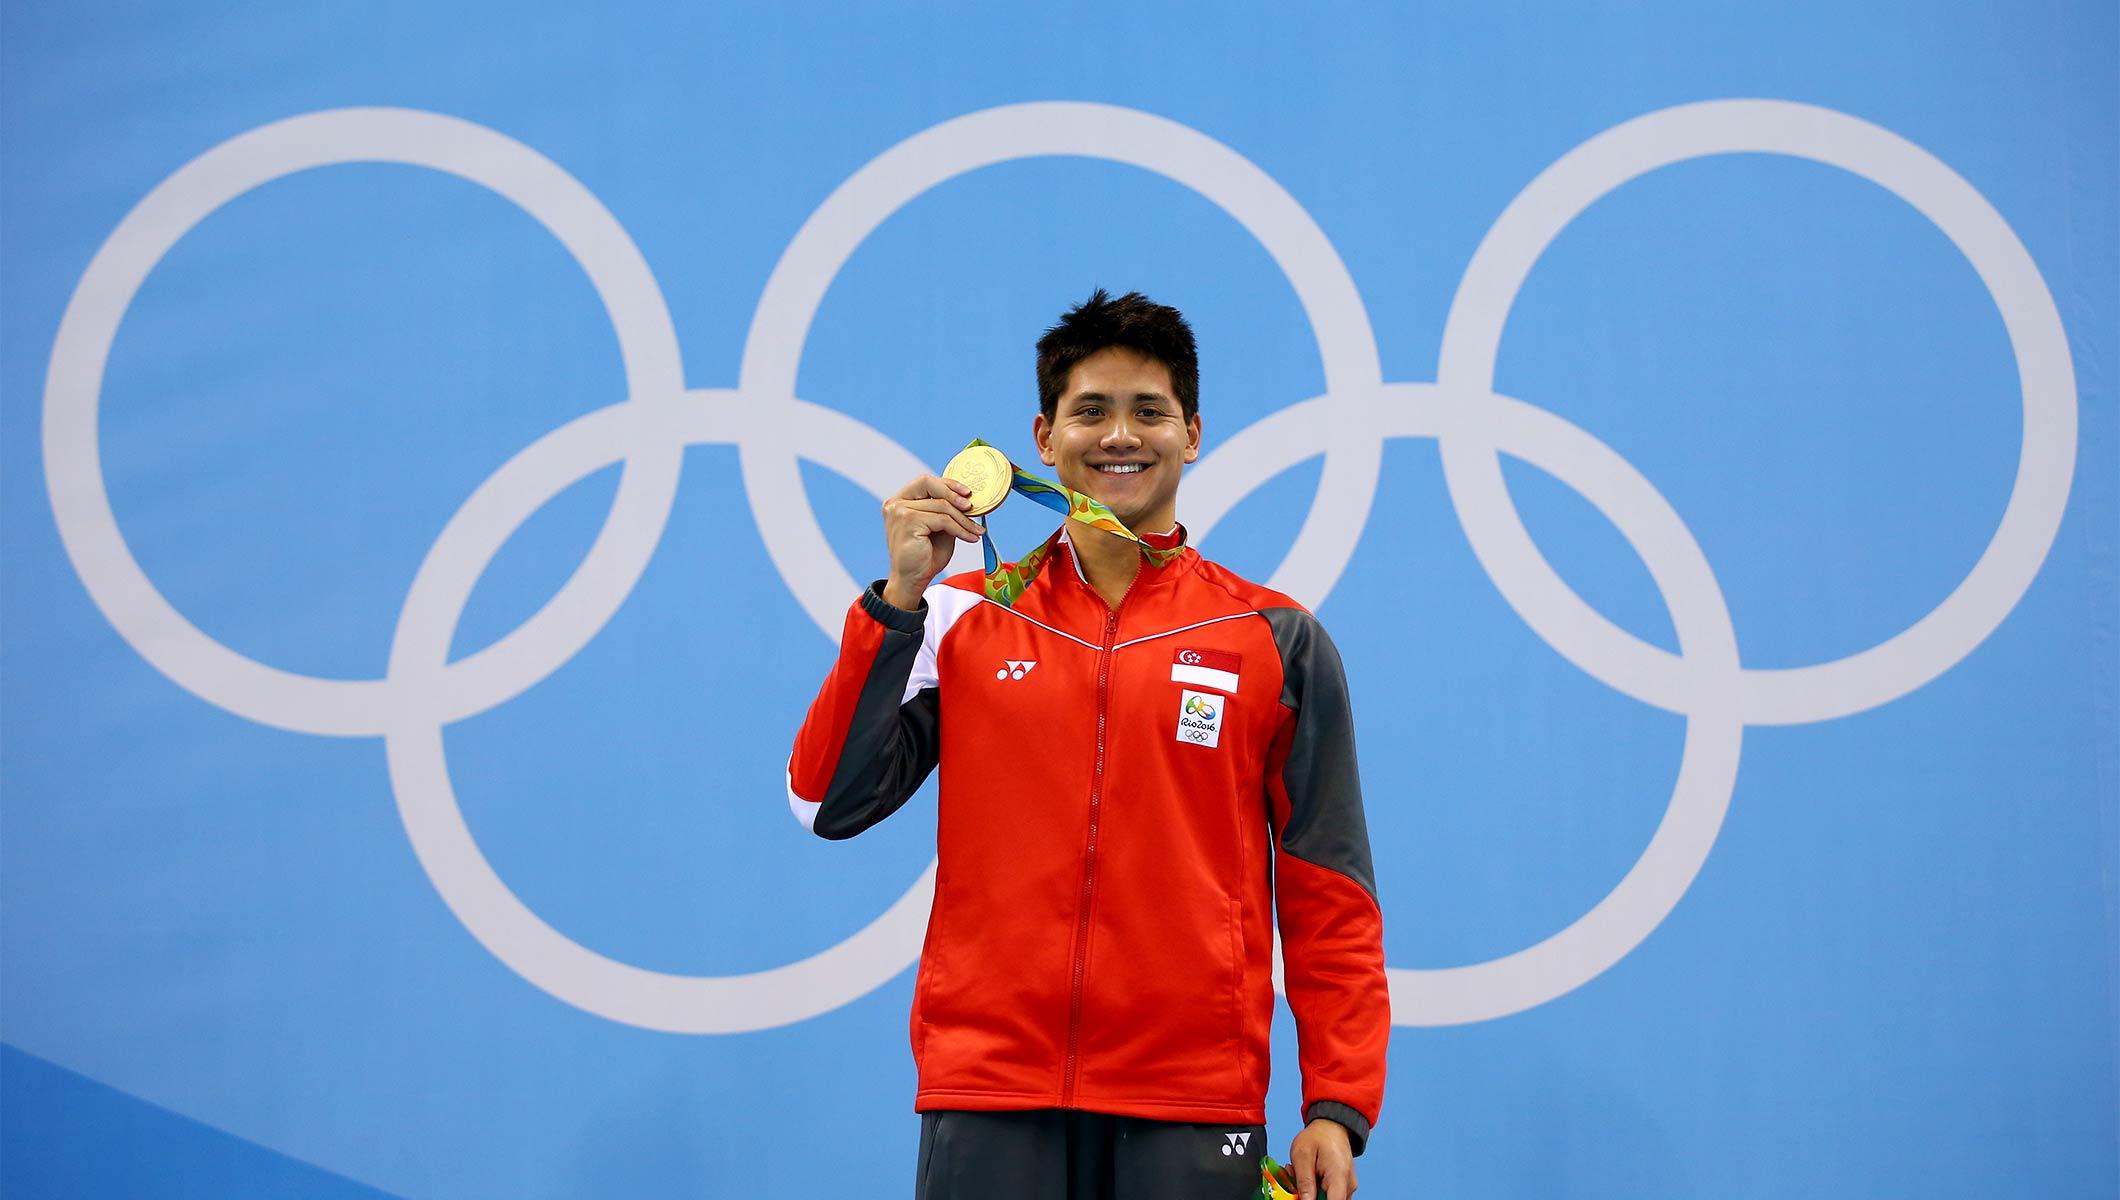 Cầu thủ bóng rổ Indonesia Surliyadin